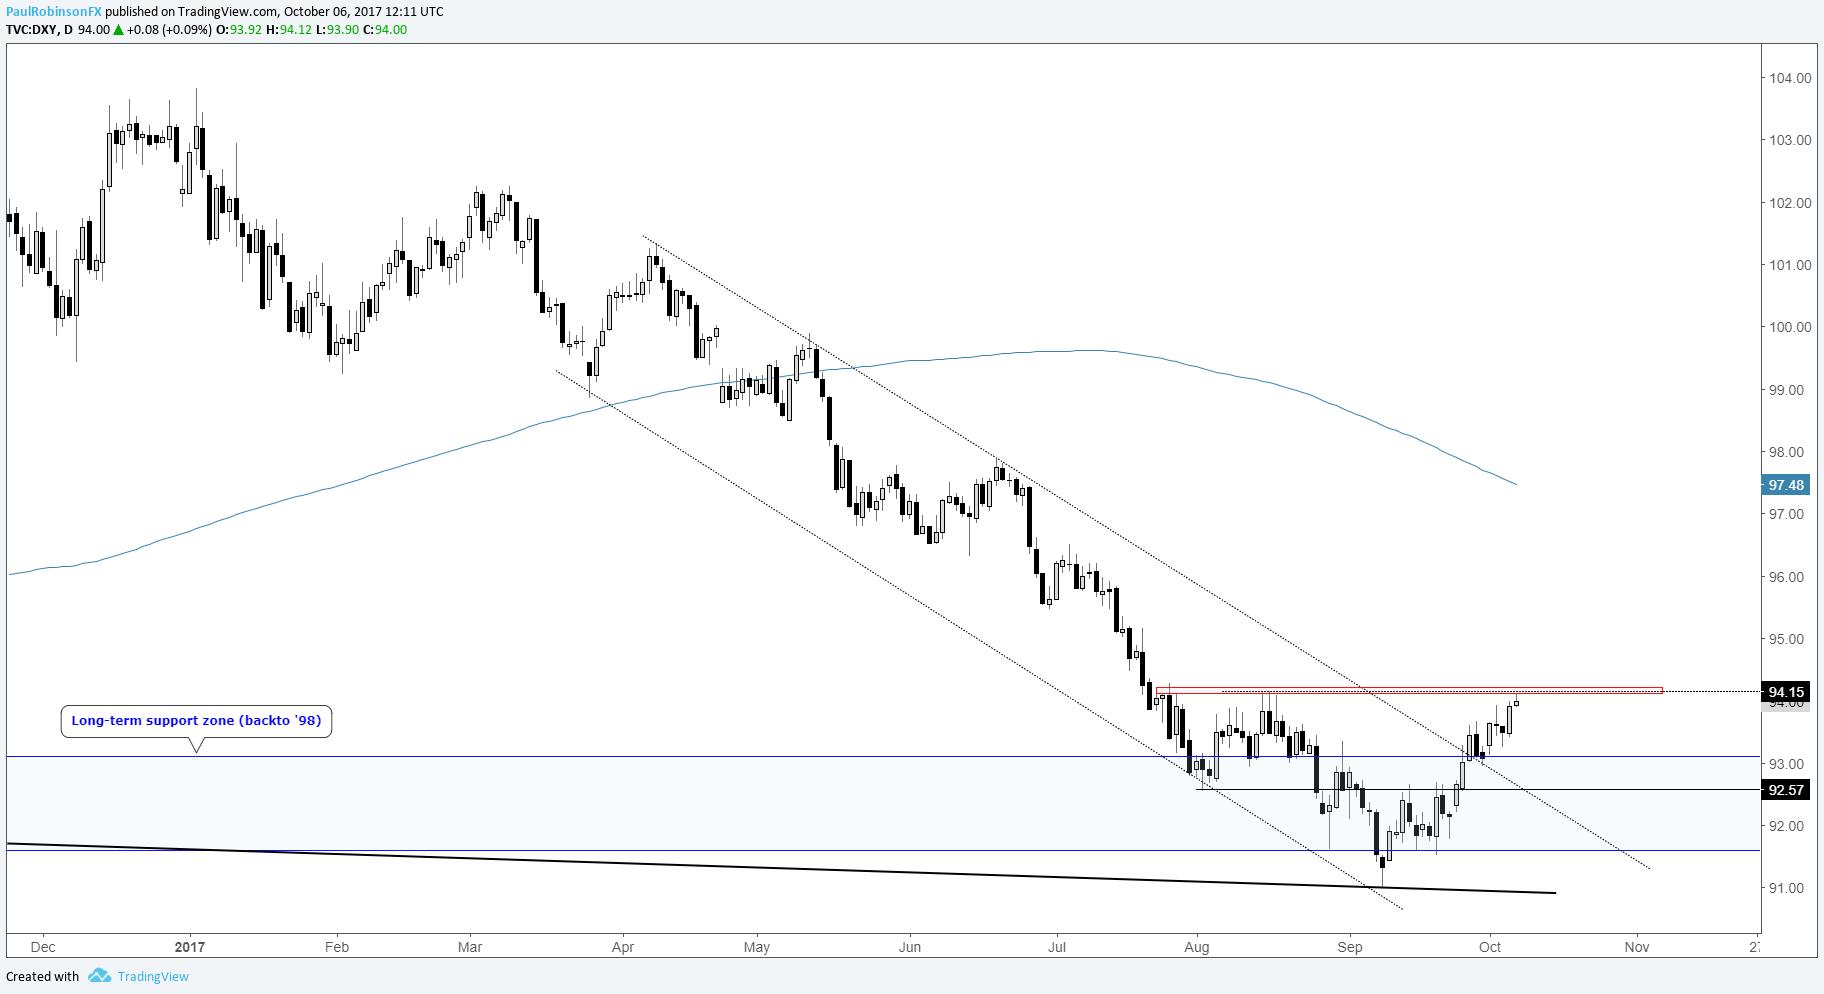 Forex market outlook next week